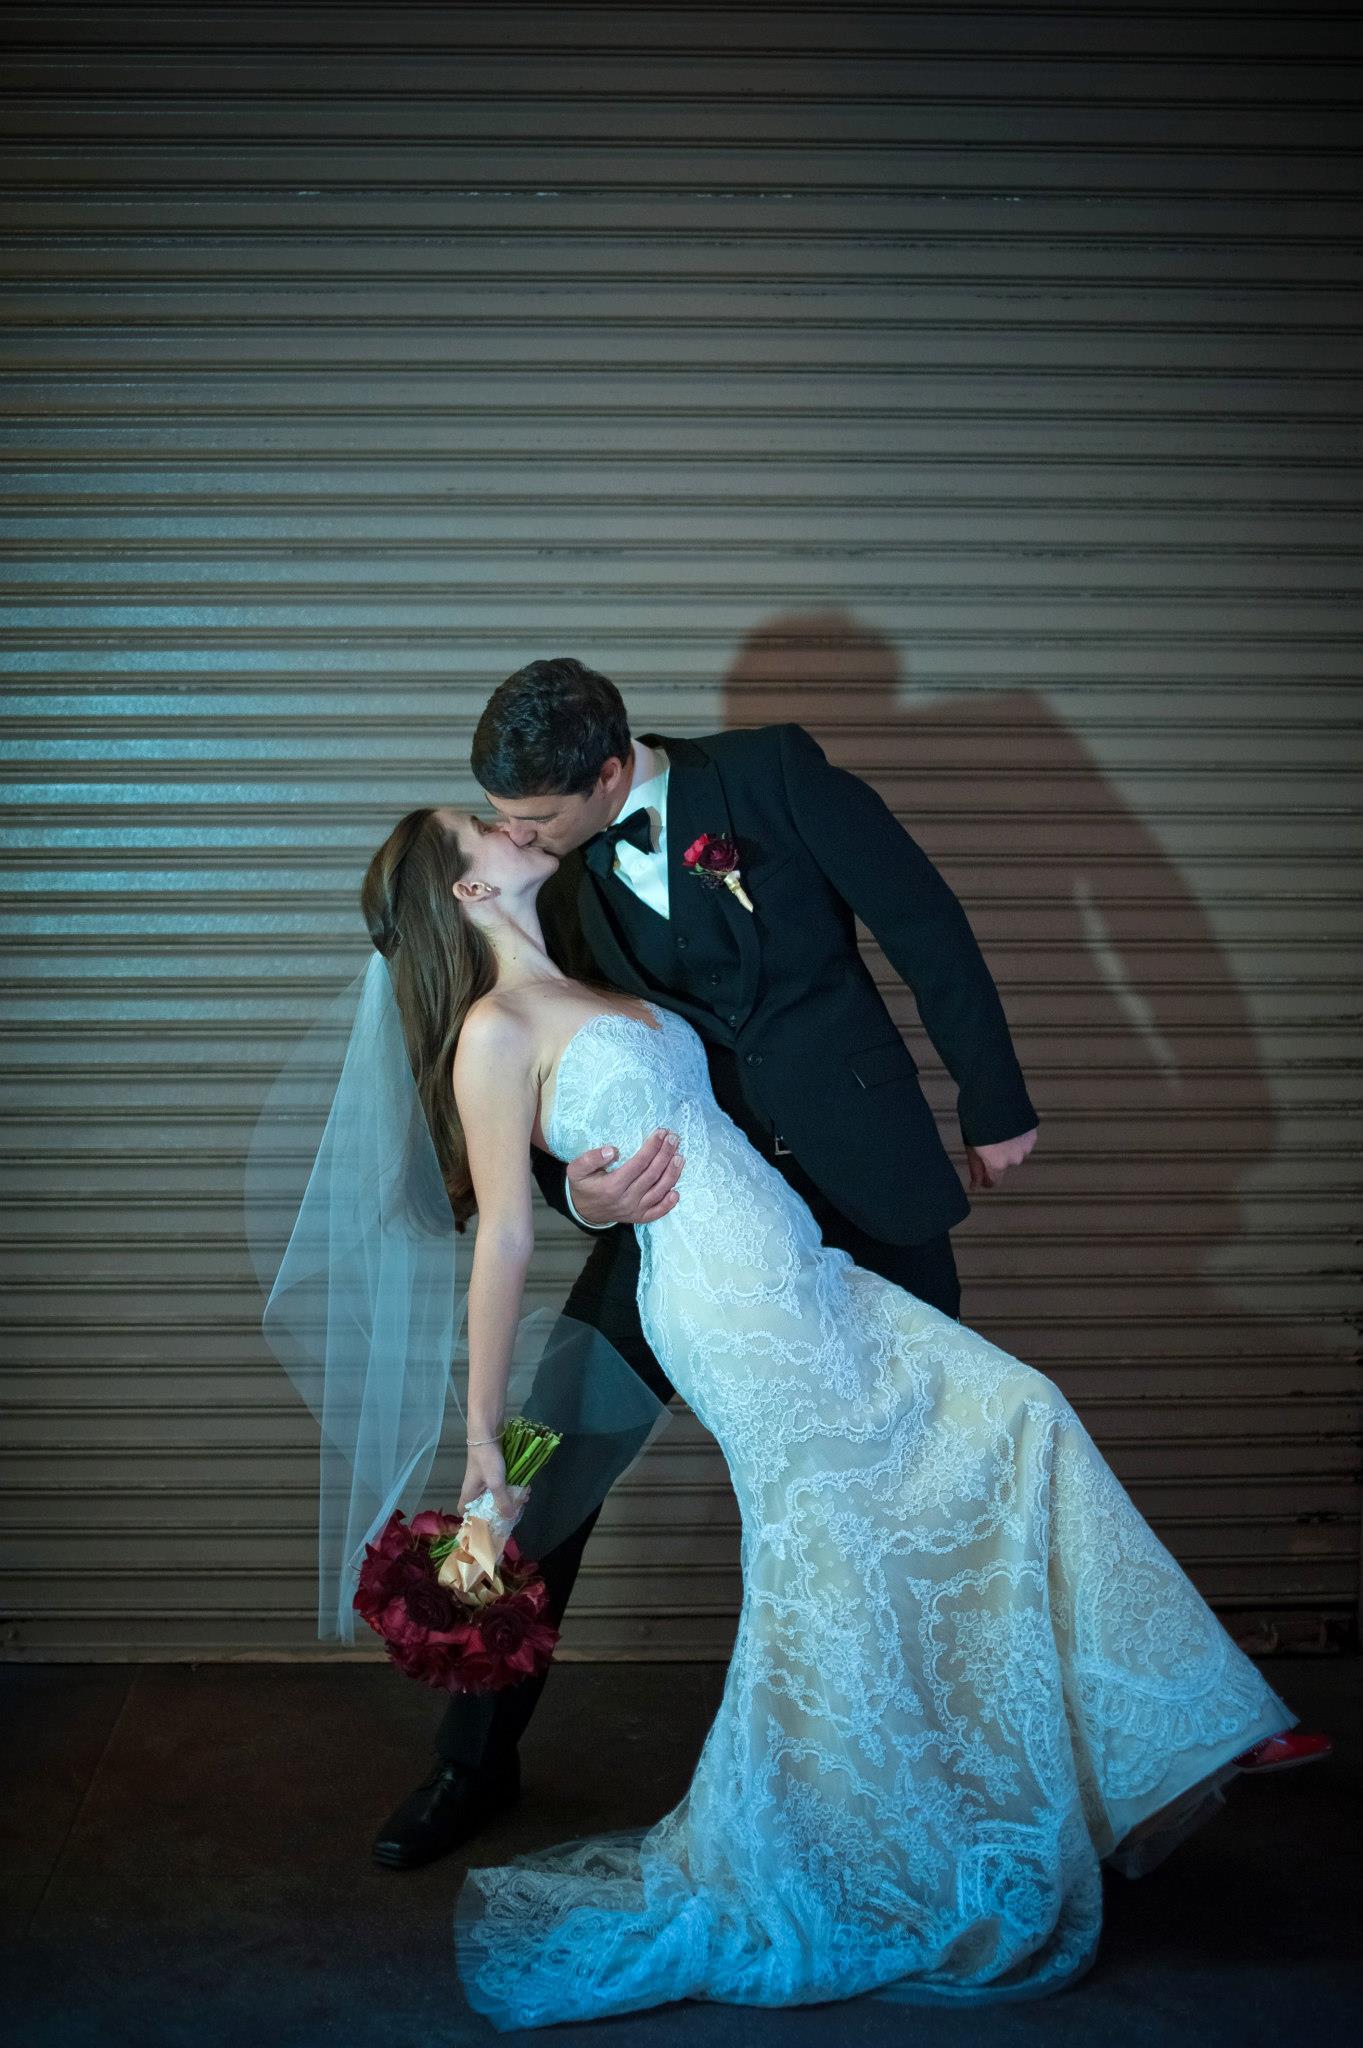 wandering_study_adventure_videographer_juan_turcios_wedding_photos_dip